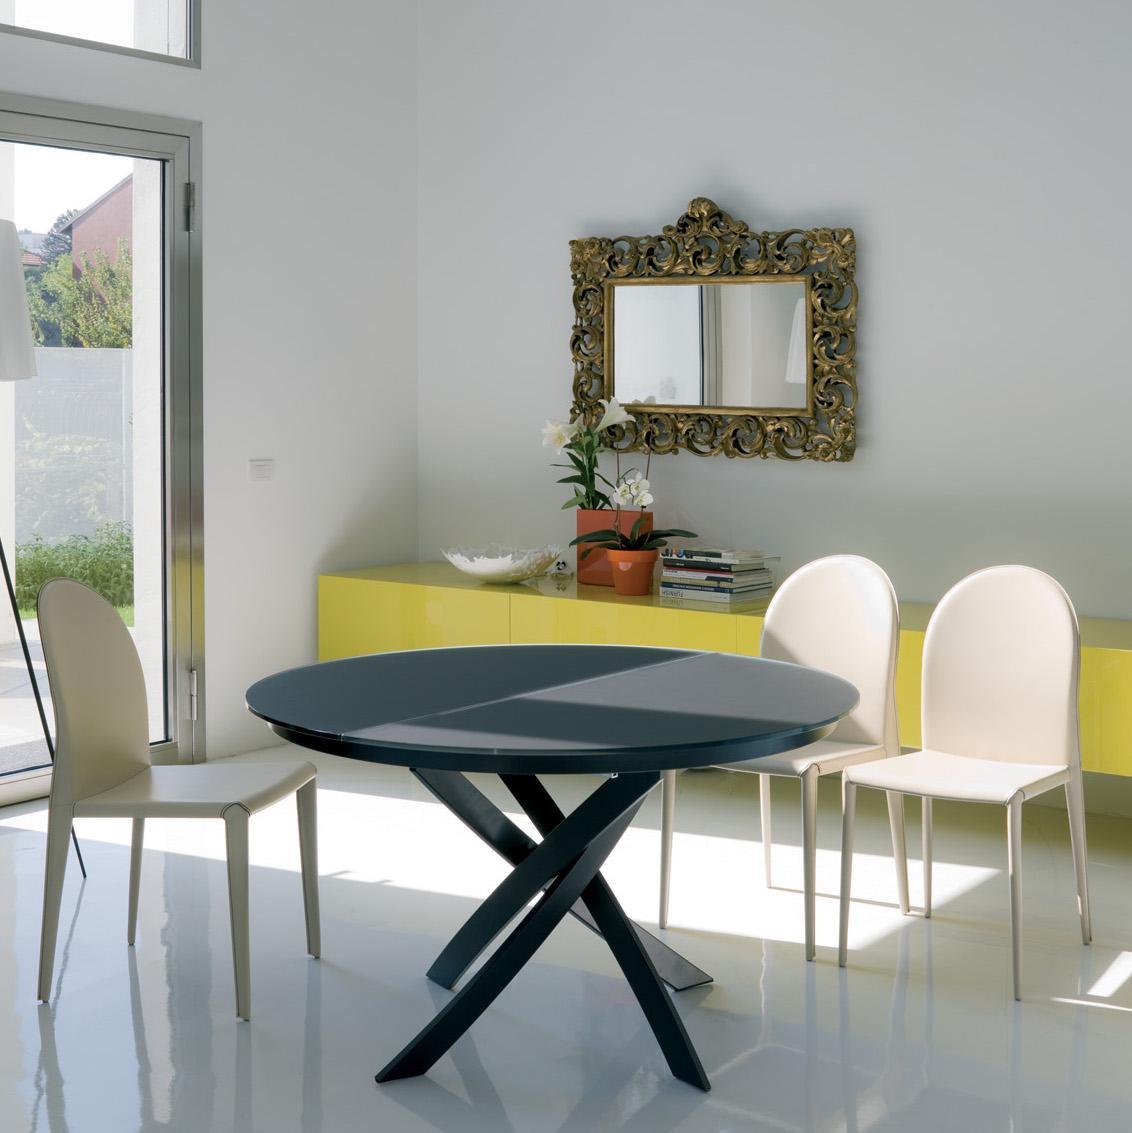 Tavolo 80x80 Allungabile Ikea. Elegant Stunning Tavolo Con Sgabelli ...